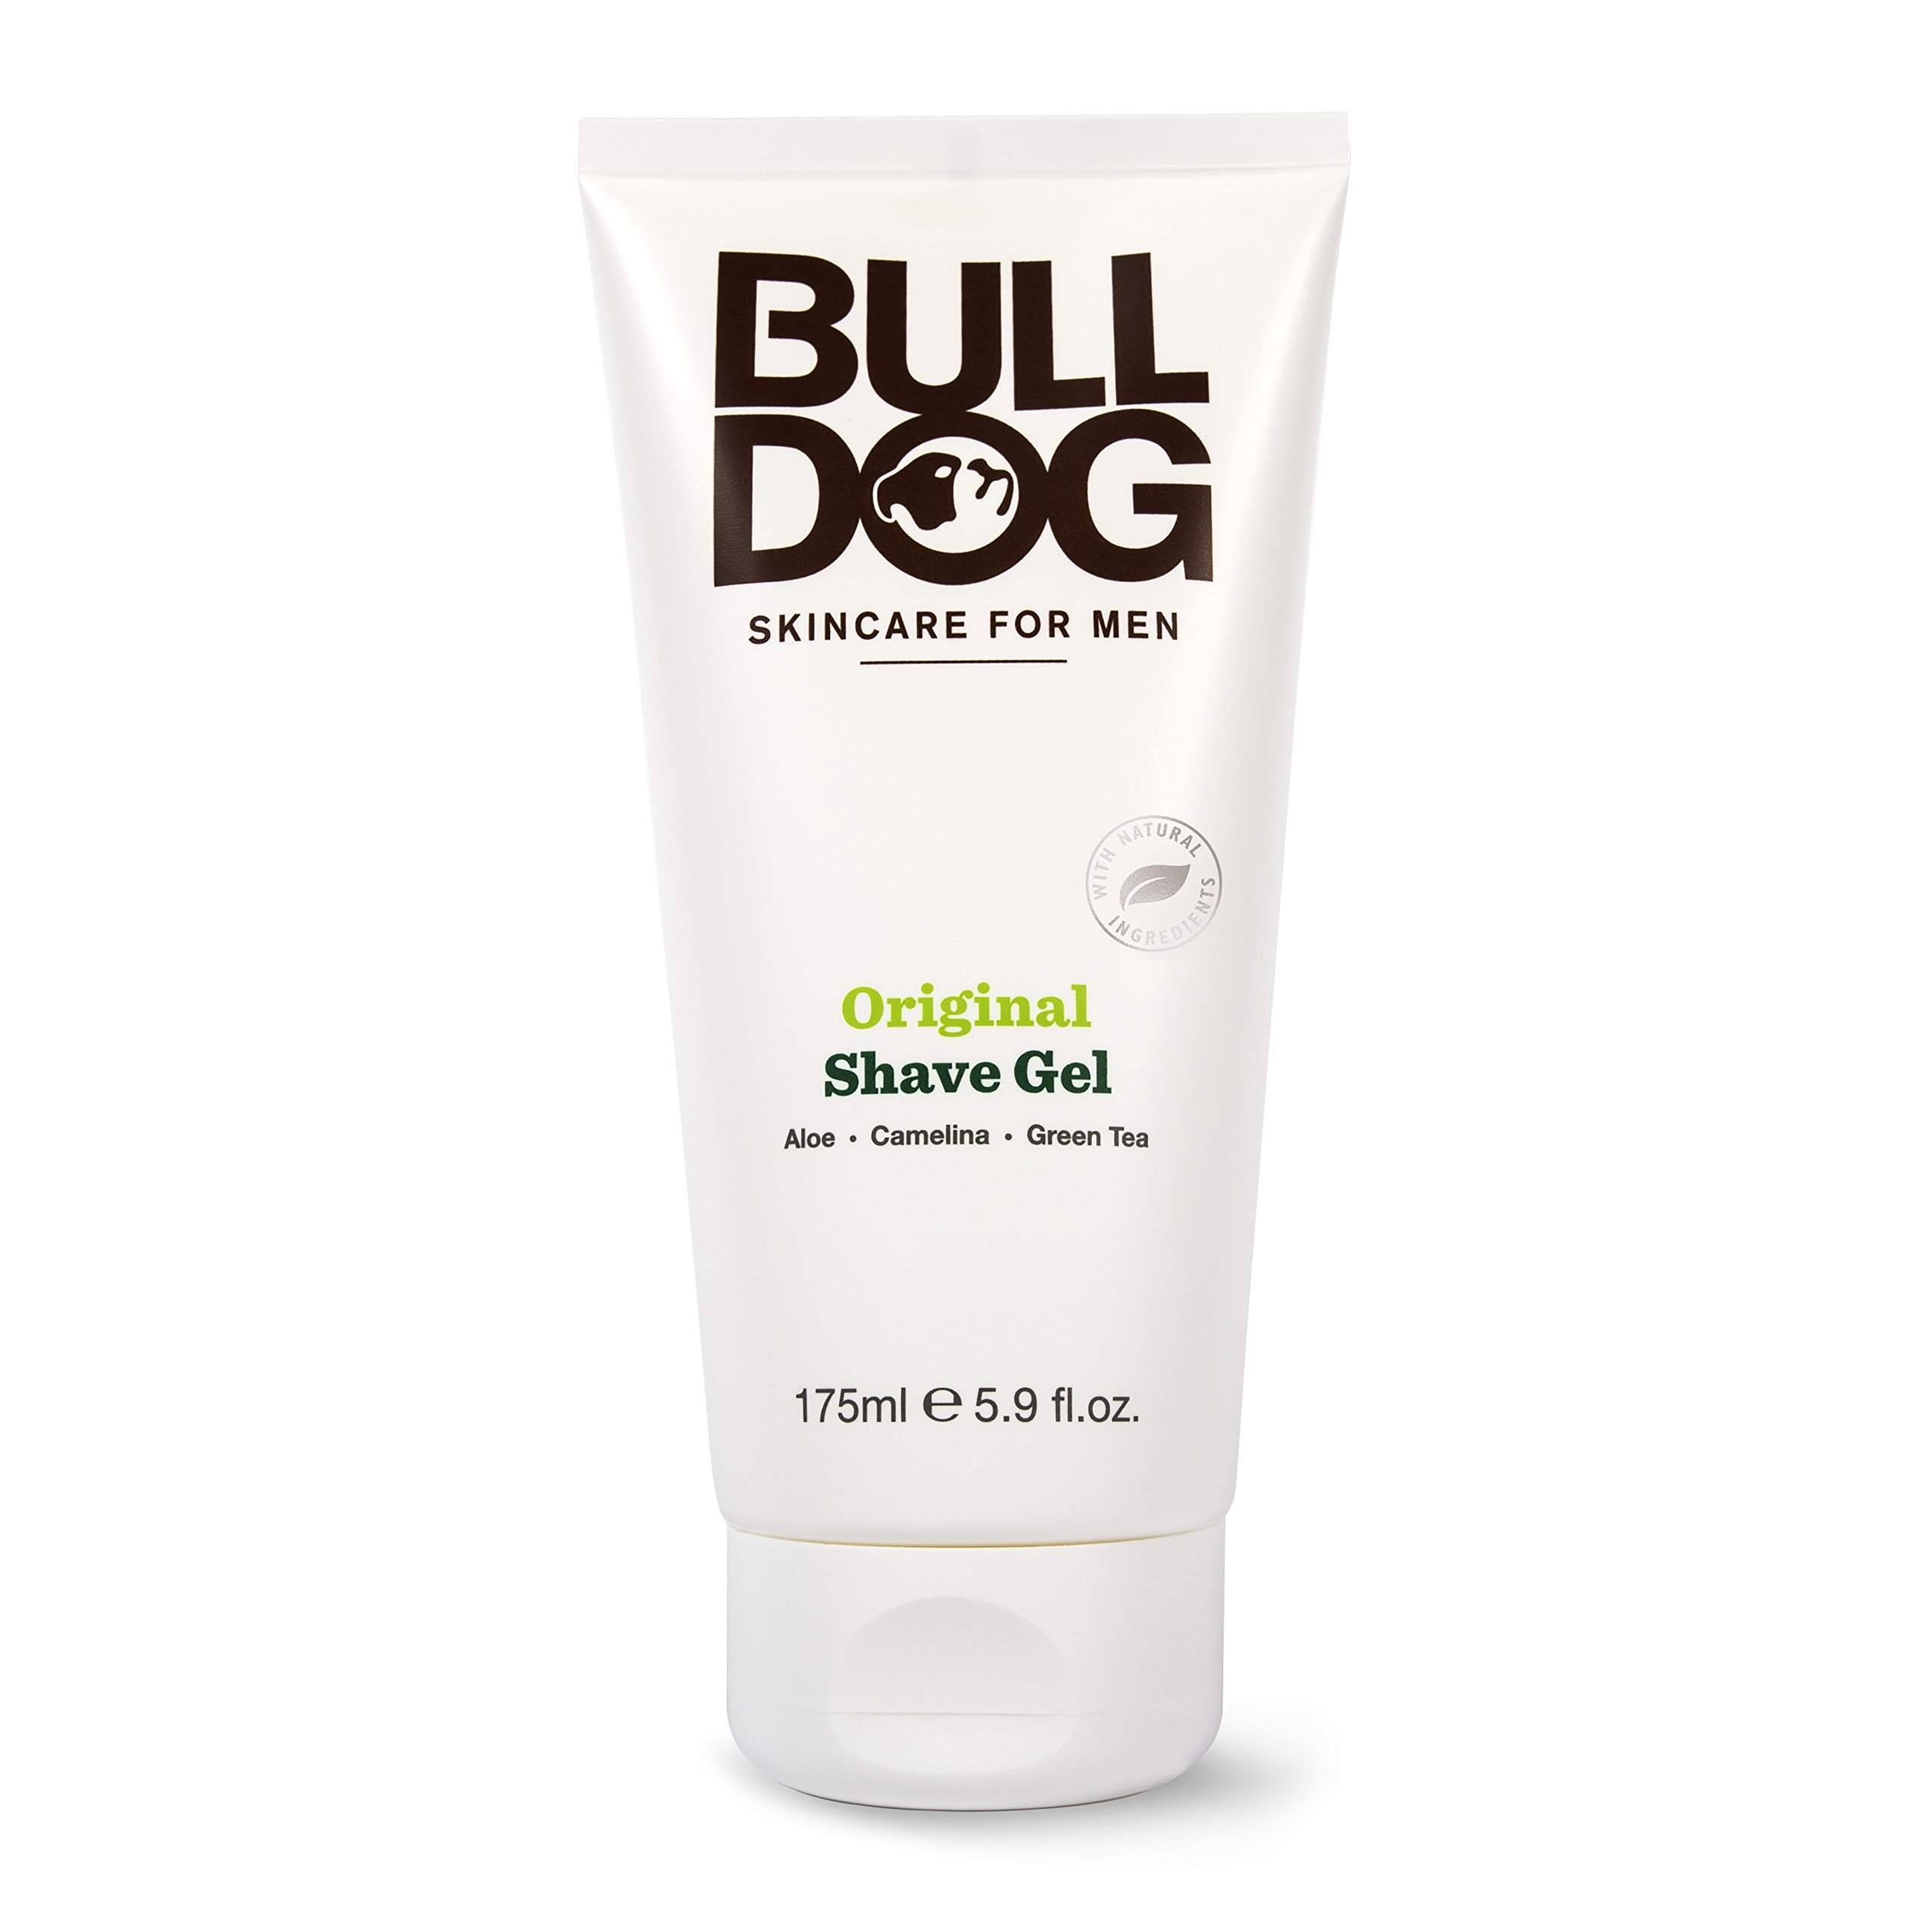 Bulldog Natural Skincare Sensitive Skin Shaving Cream - 5.9 fl oz